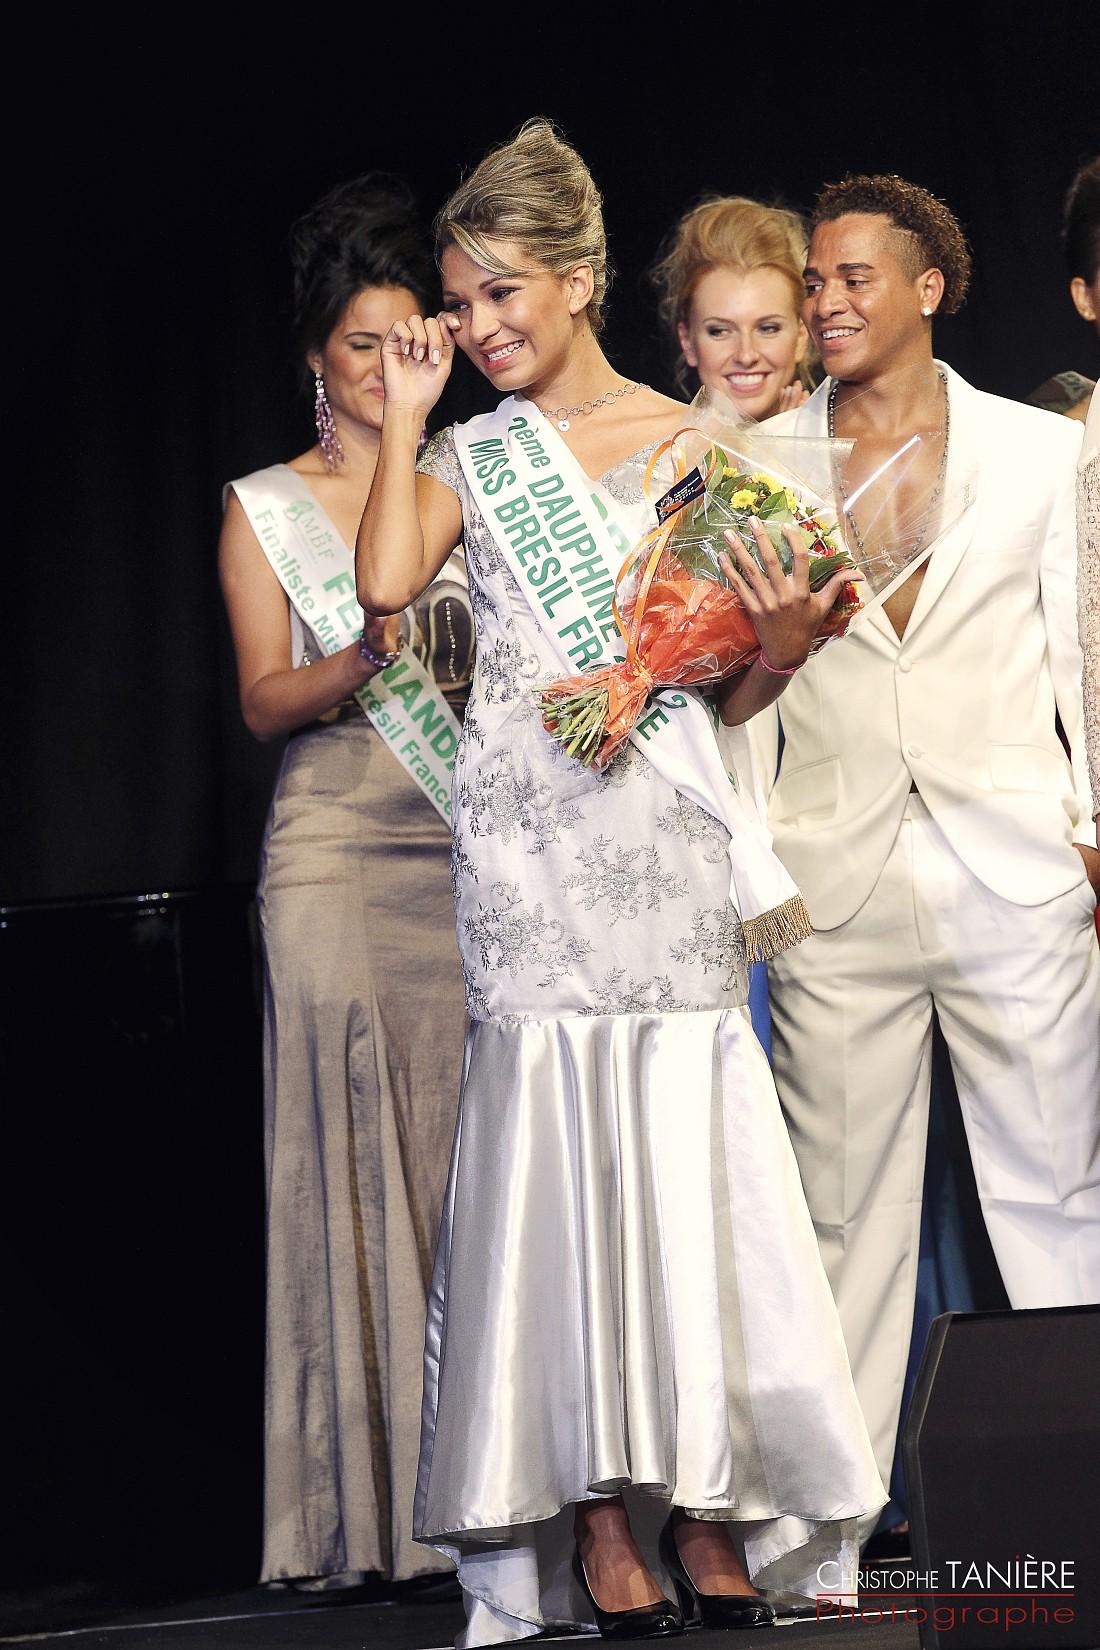 deuxieme dauphine-Priscilla Souza Matos-Miss Bresil France